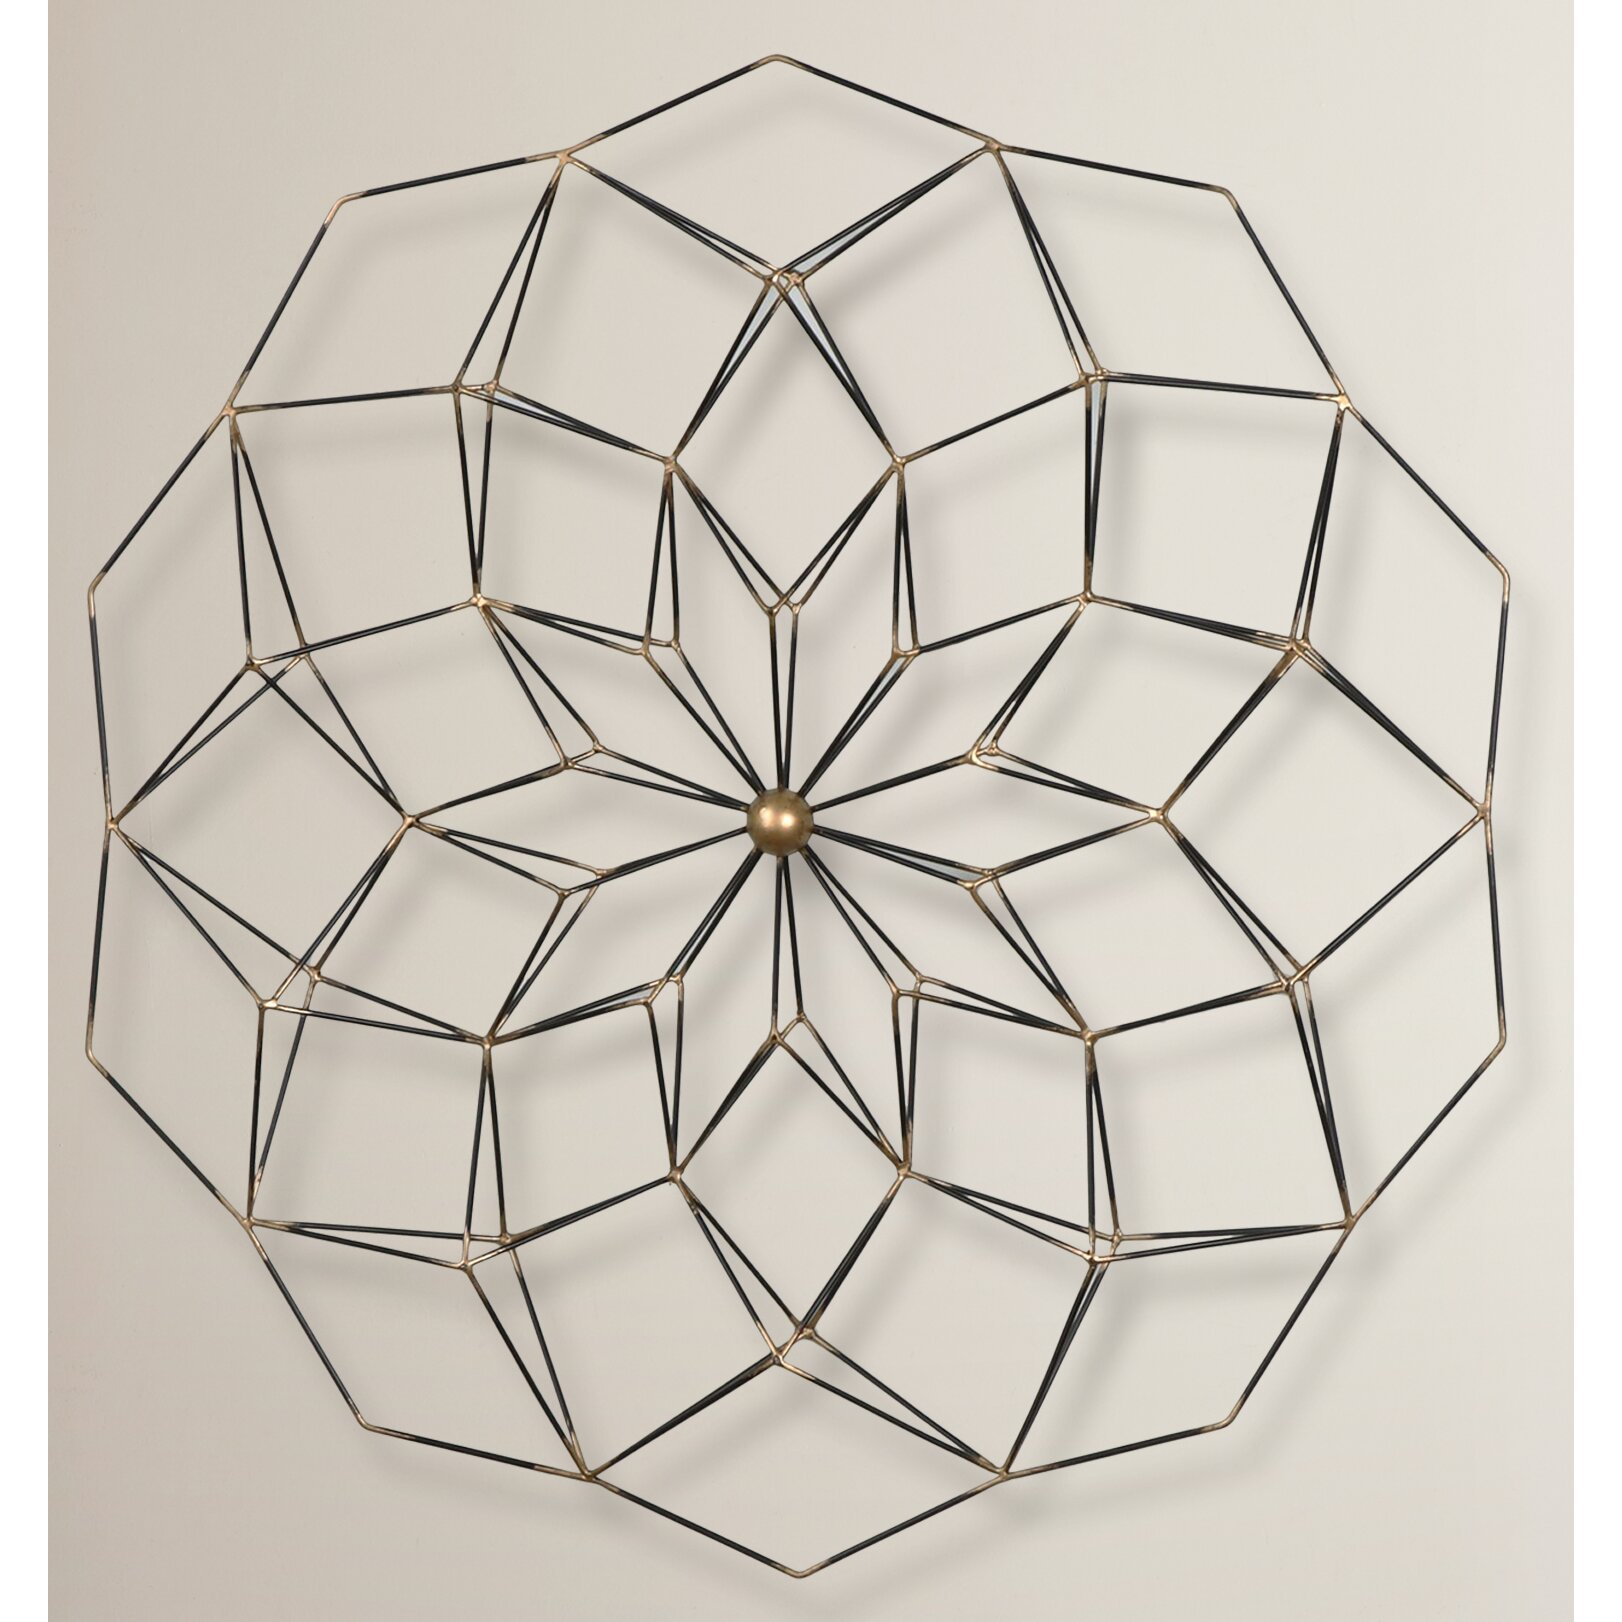 Brayden Studio Geometric Floral Framed Wall Art & Reviews